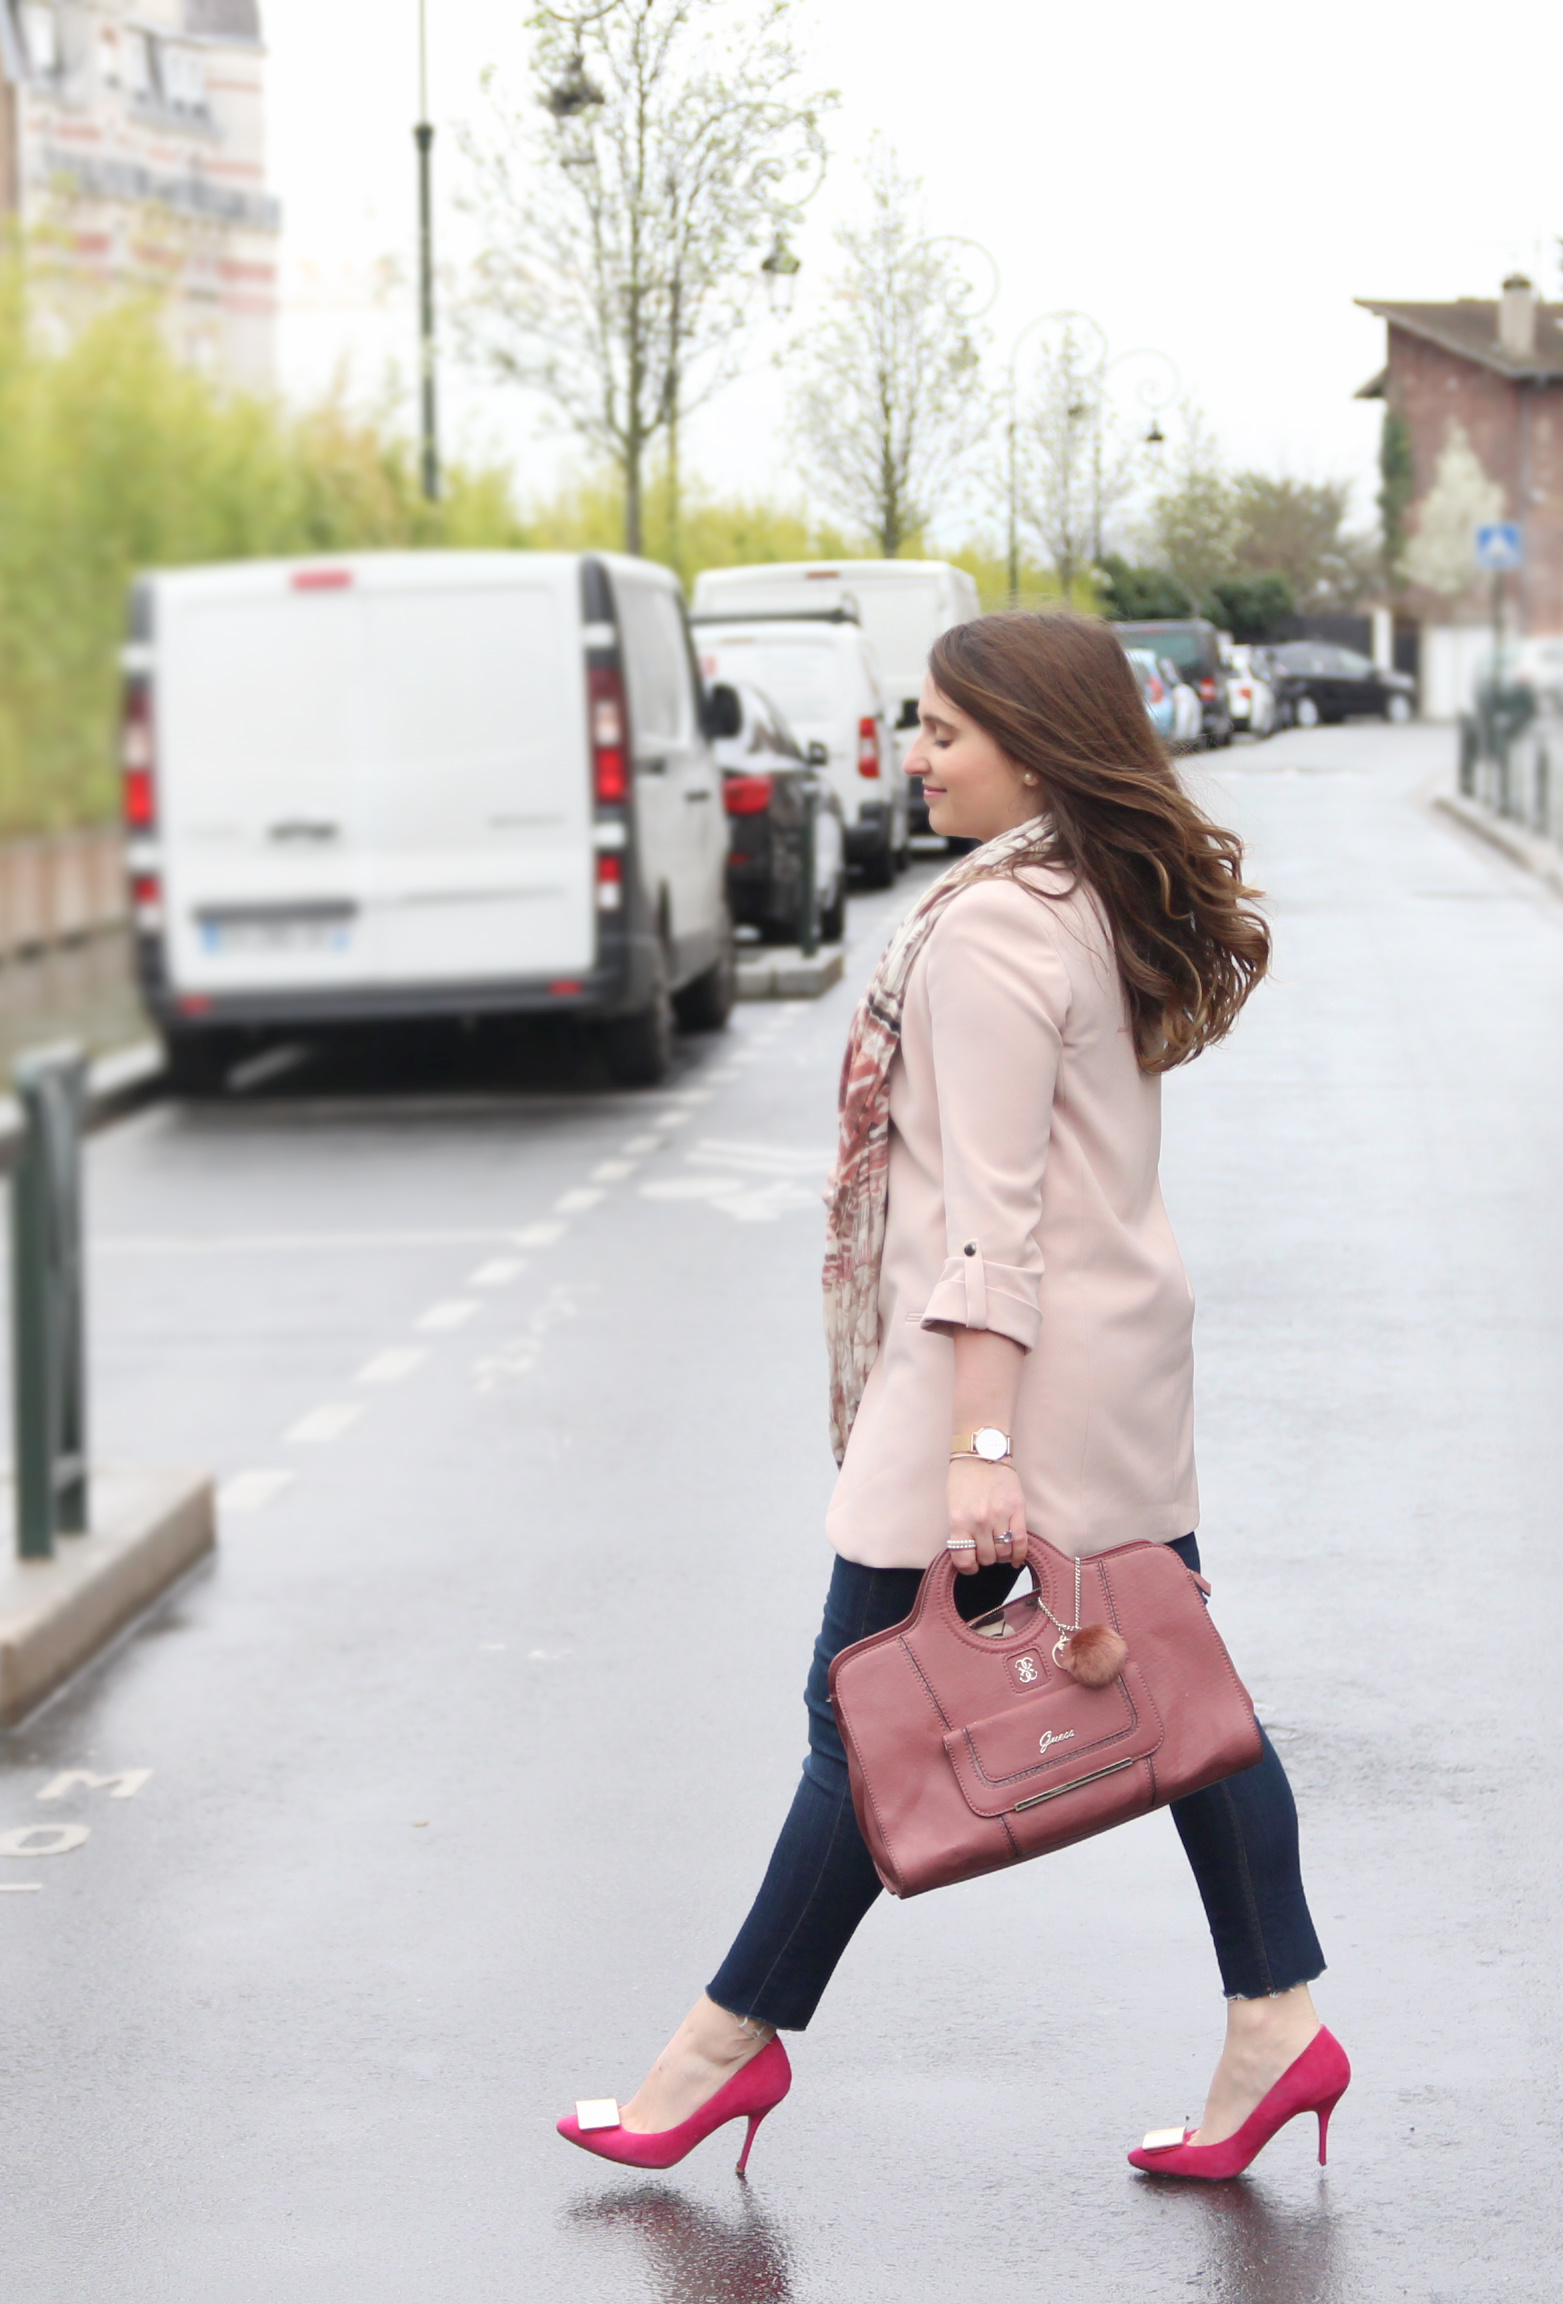 fashionblogger-influencer-jacket-zara-rosepastel-paris-seralynepointcom-2017-03-21 120513